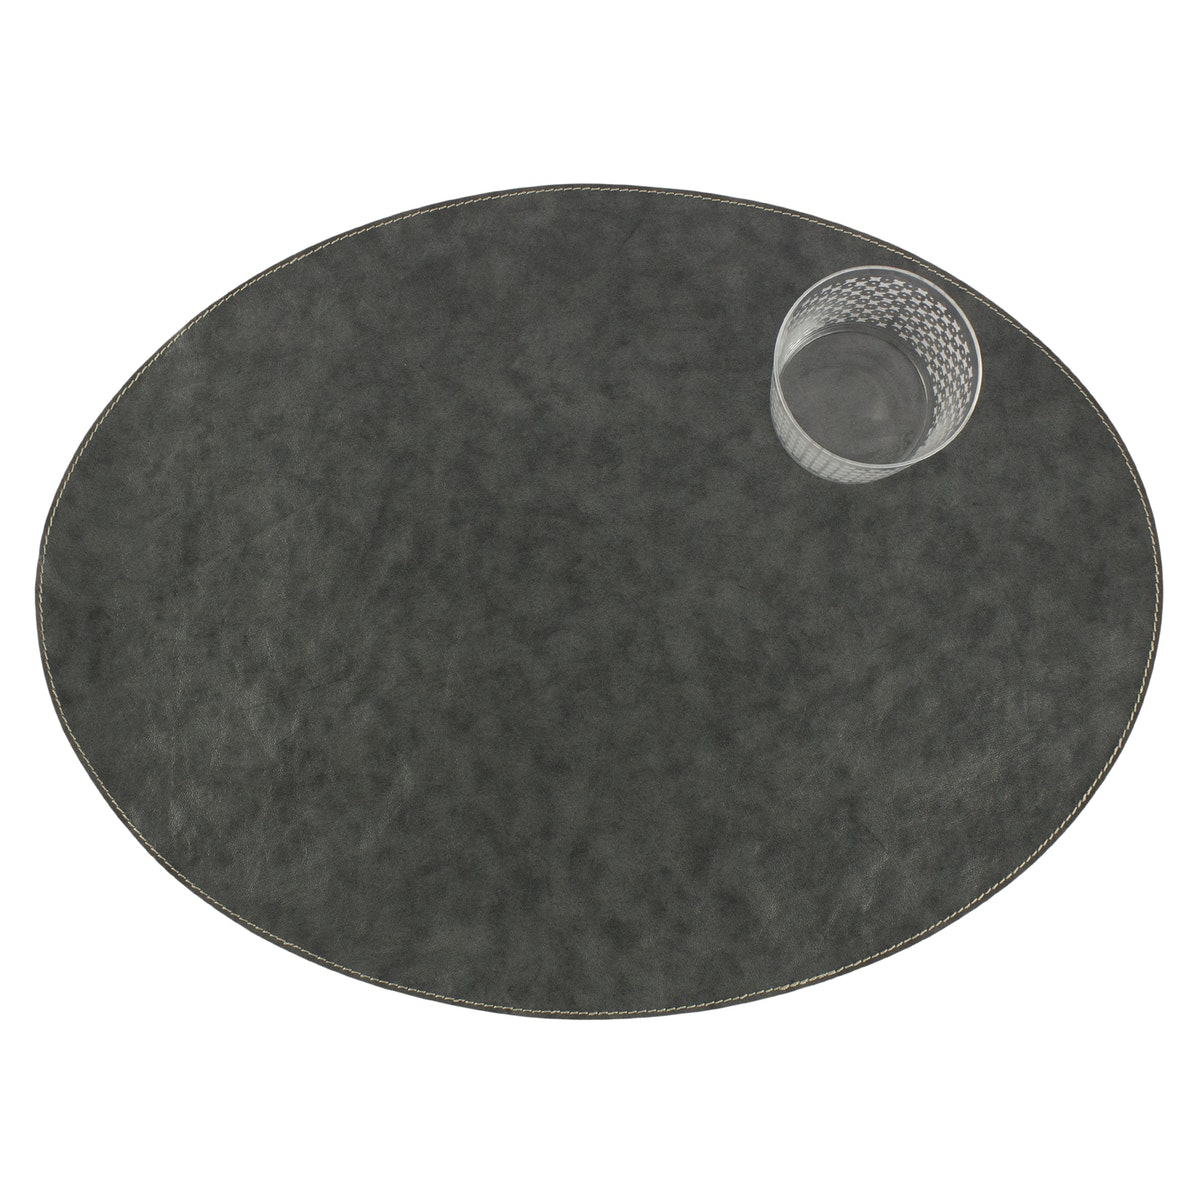 UASHMAMA Placemat Oval Tec Dark Grey